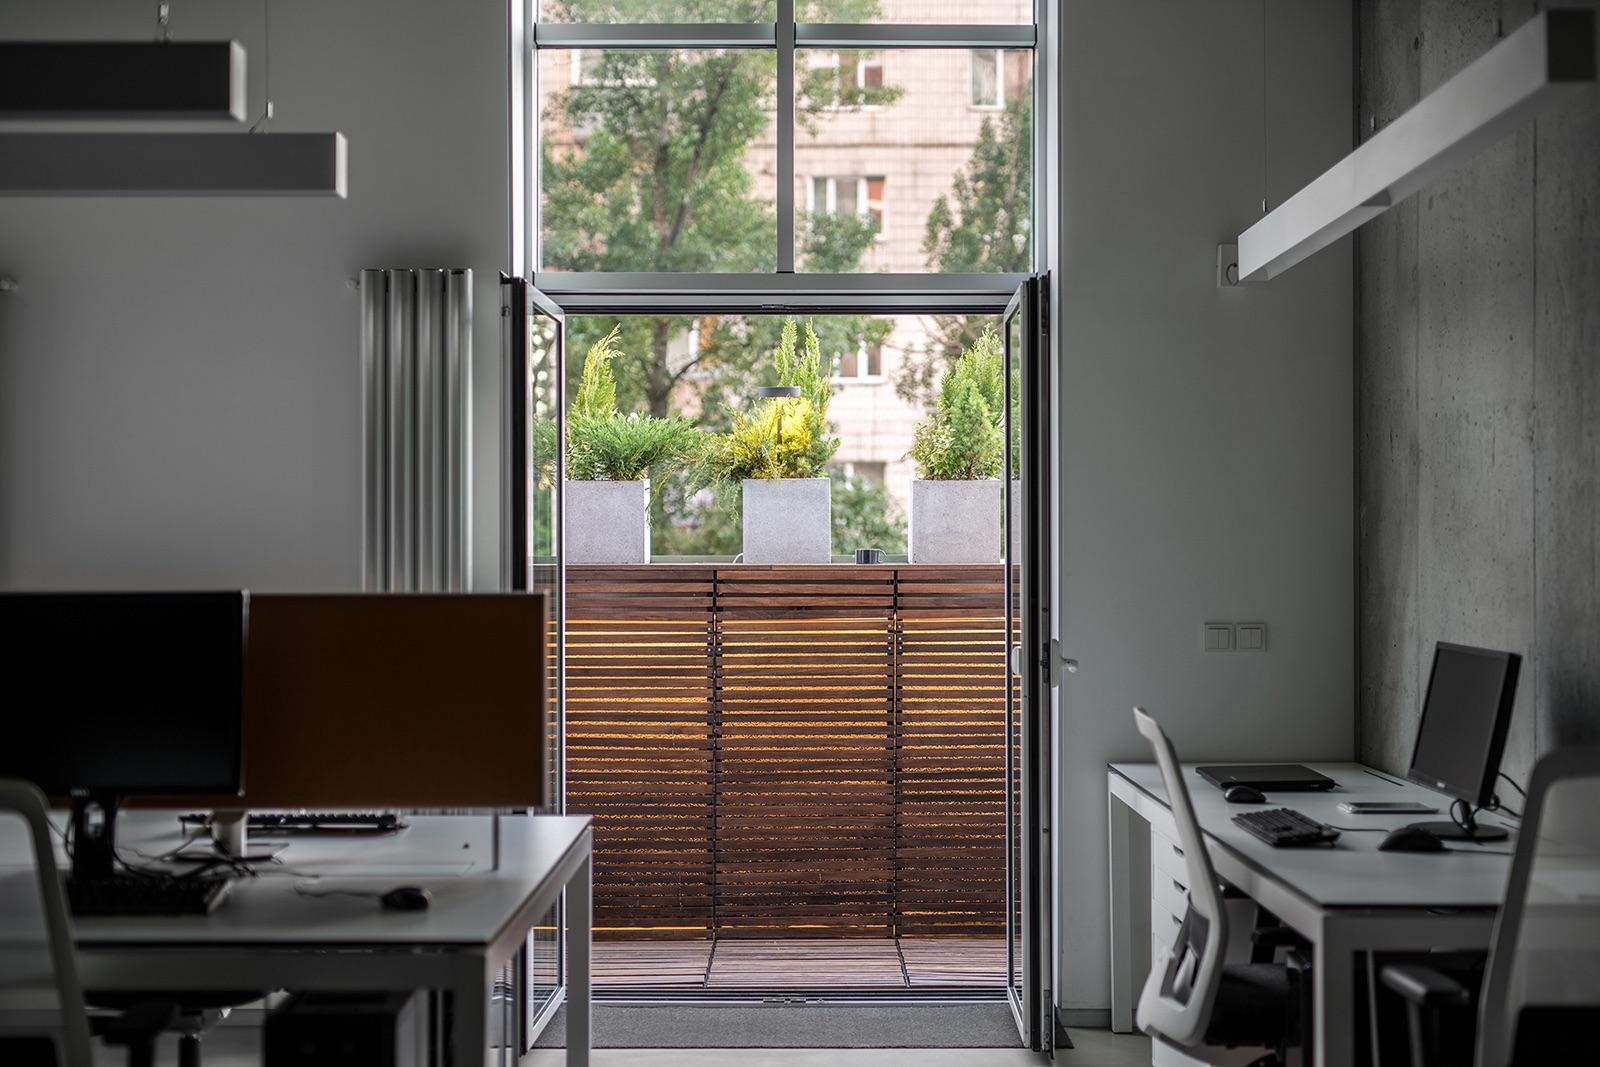 yod-design-lab-office-12